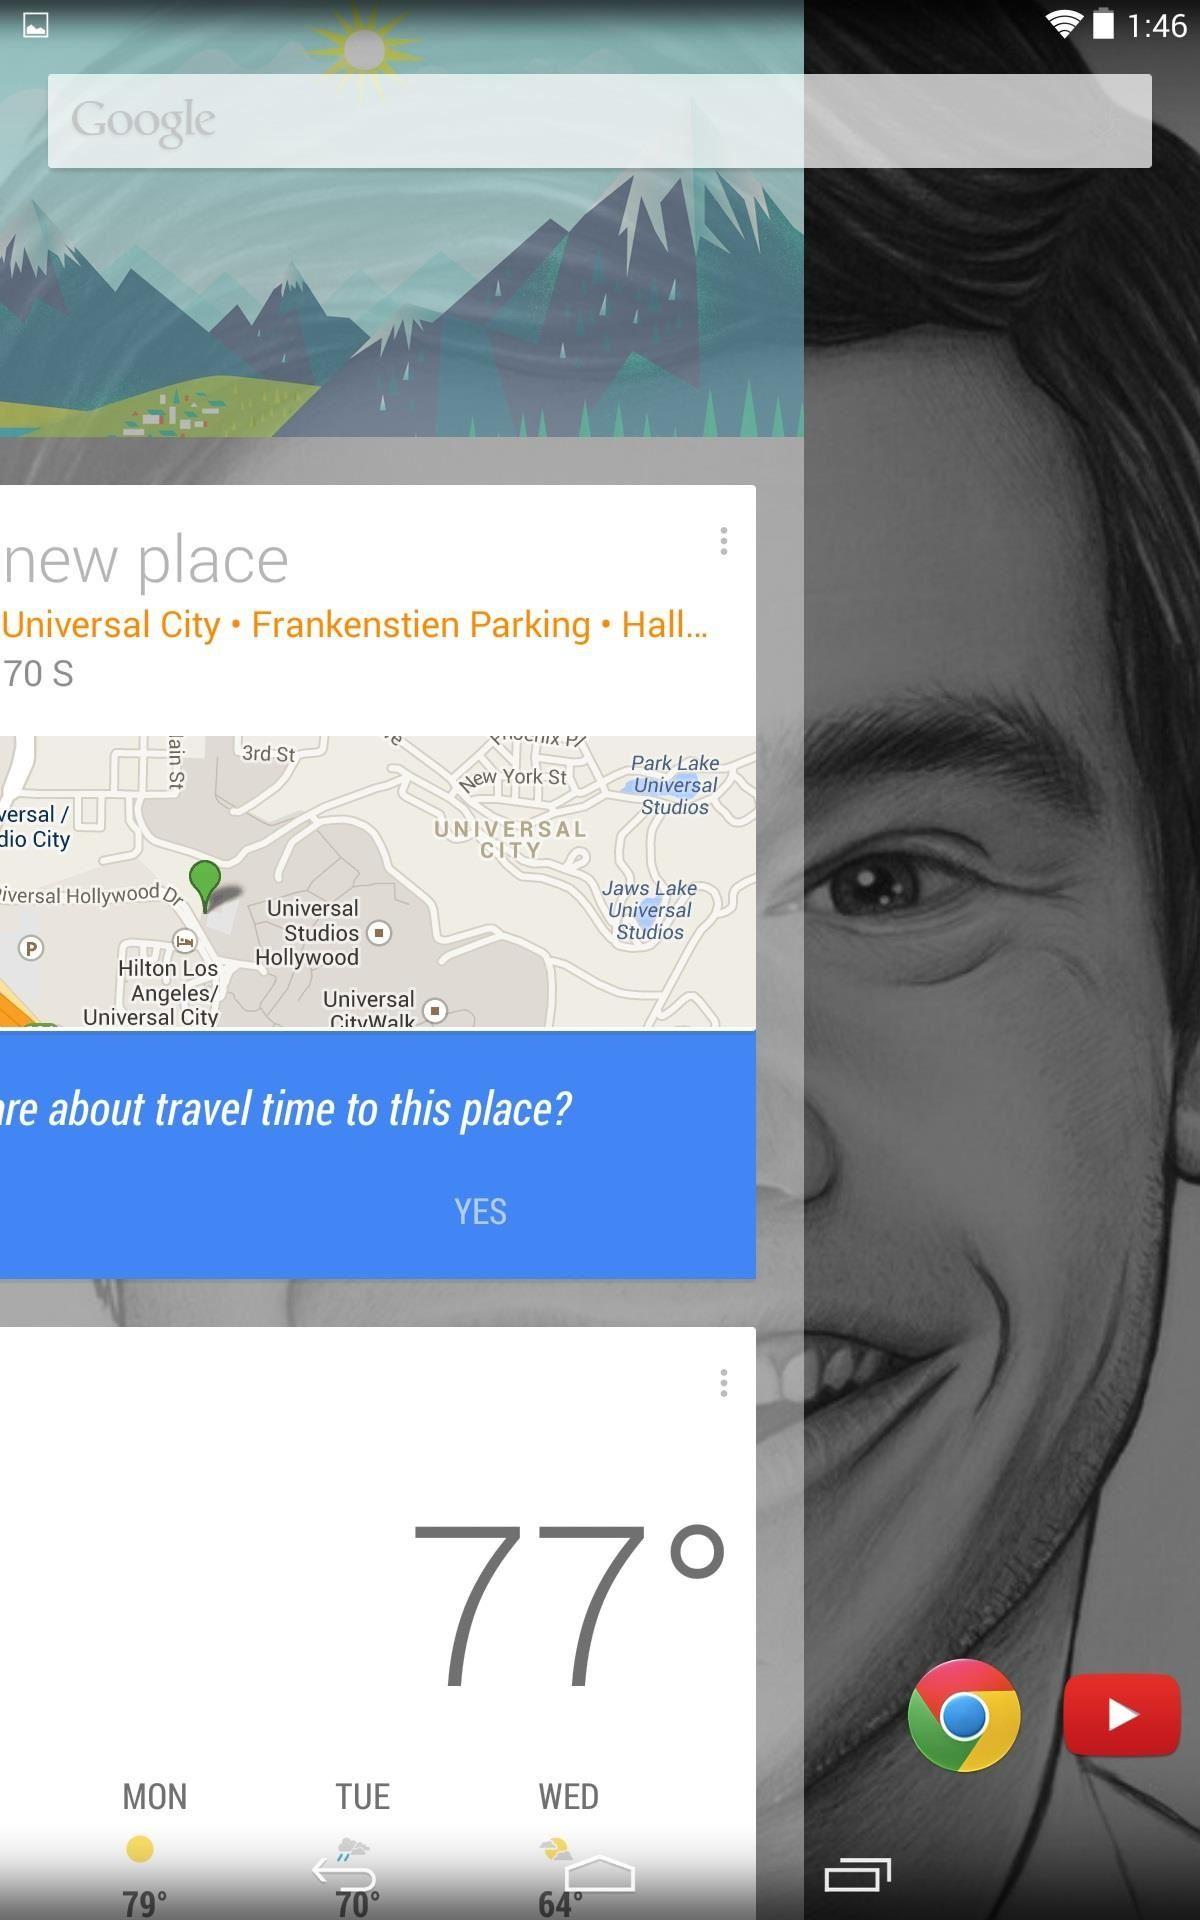 "How to Get the Exclusive Google Nexus 5 ""Experience"" Launcher on Your Nexus 7 Tablet"